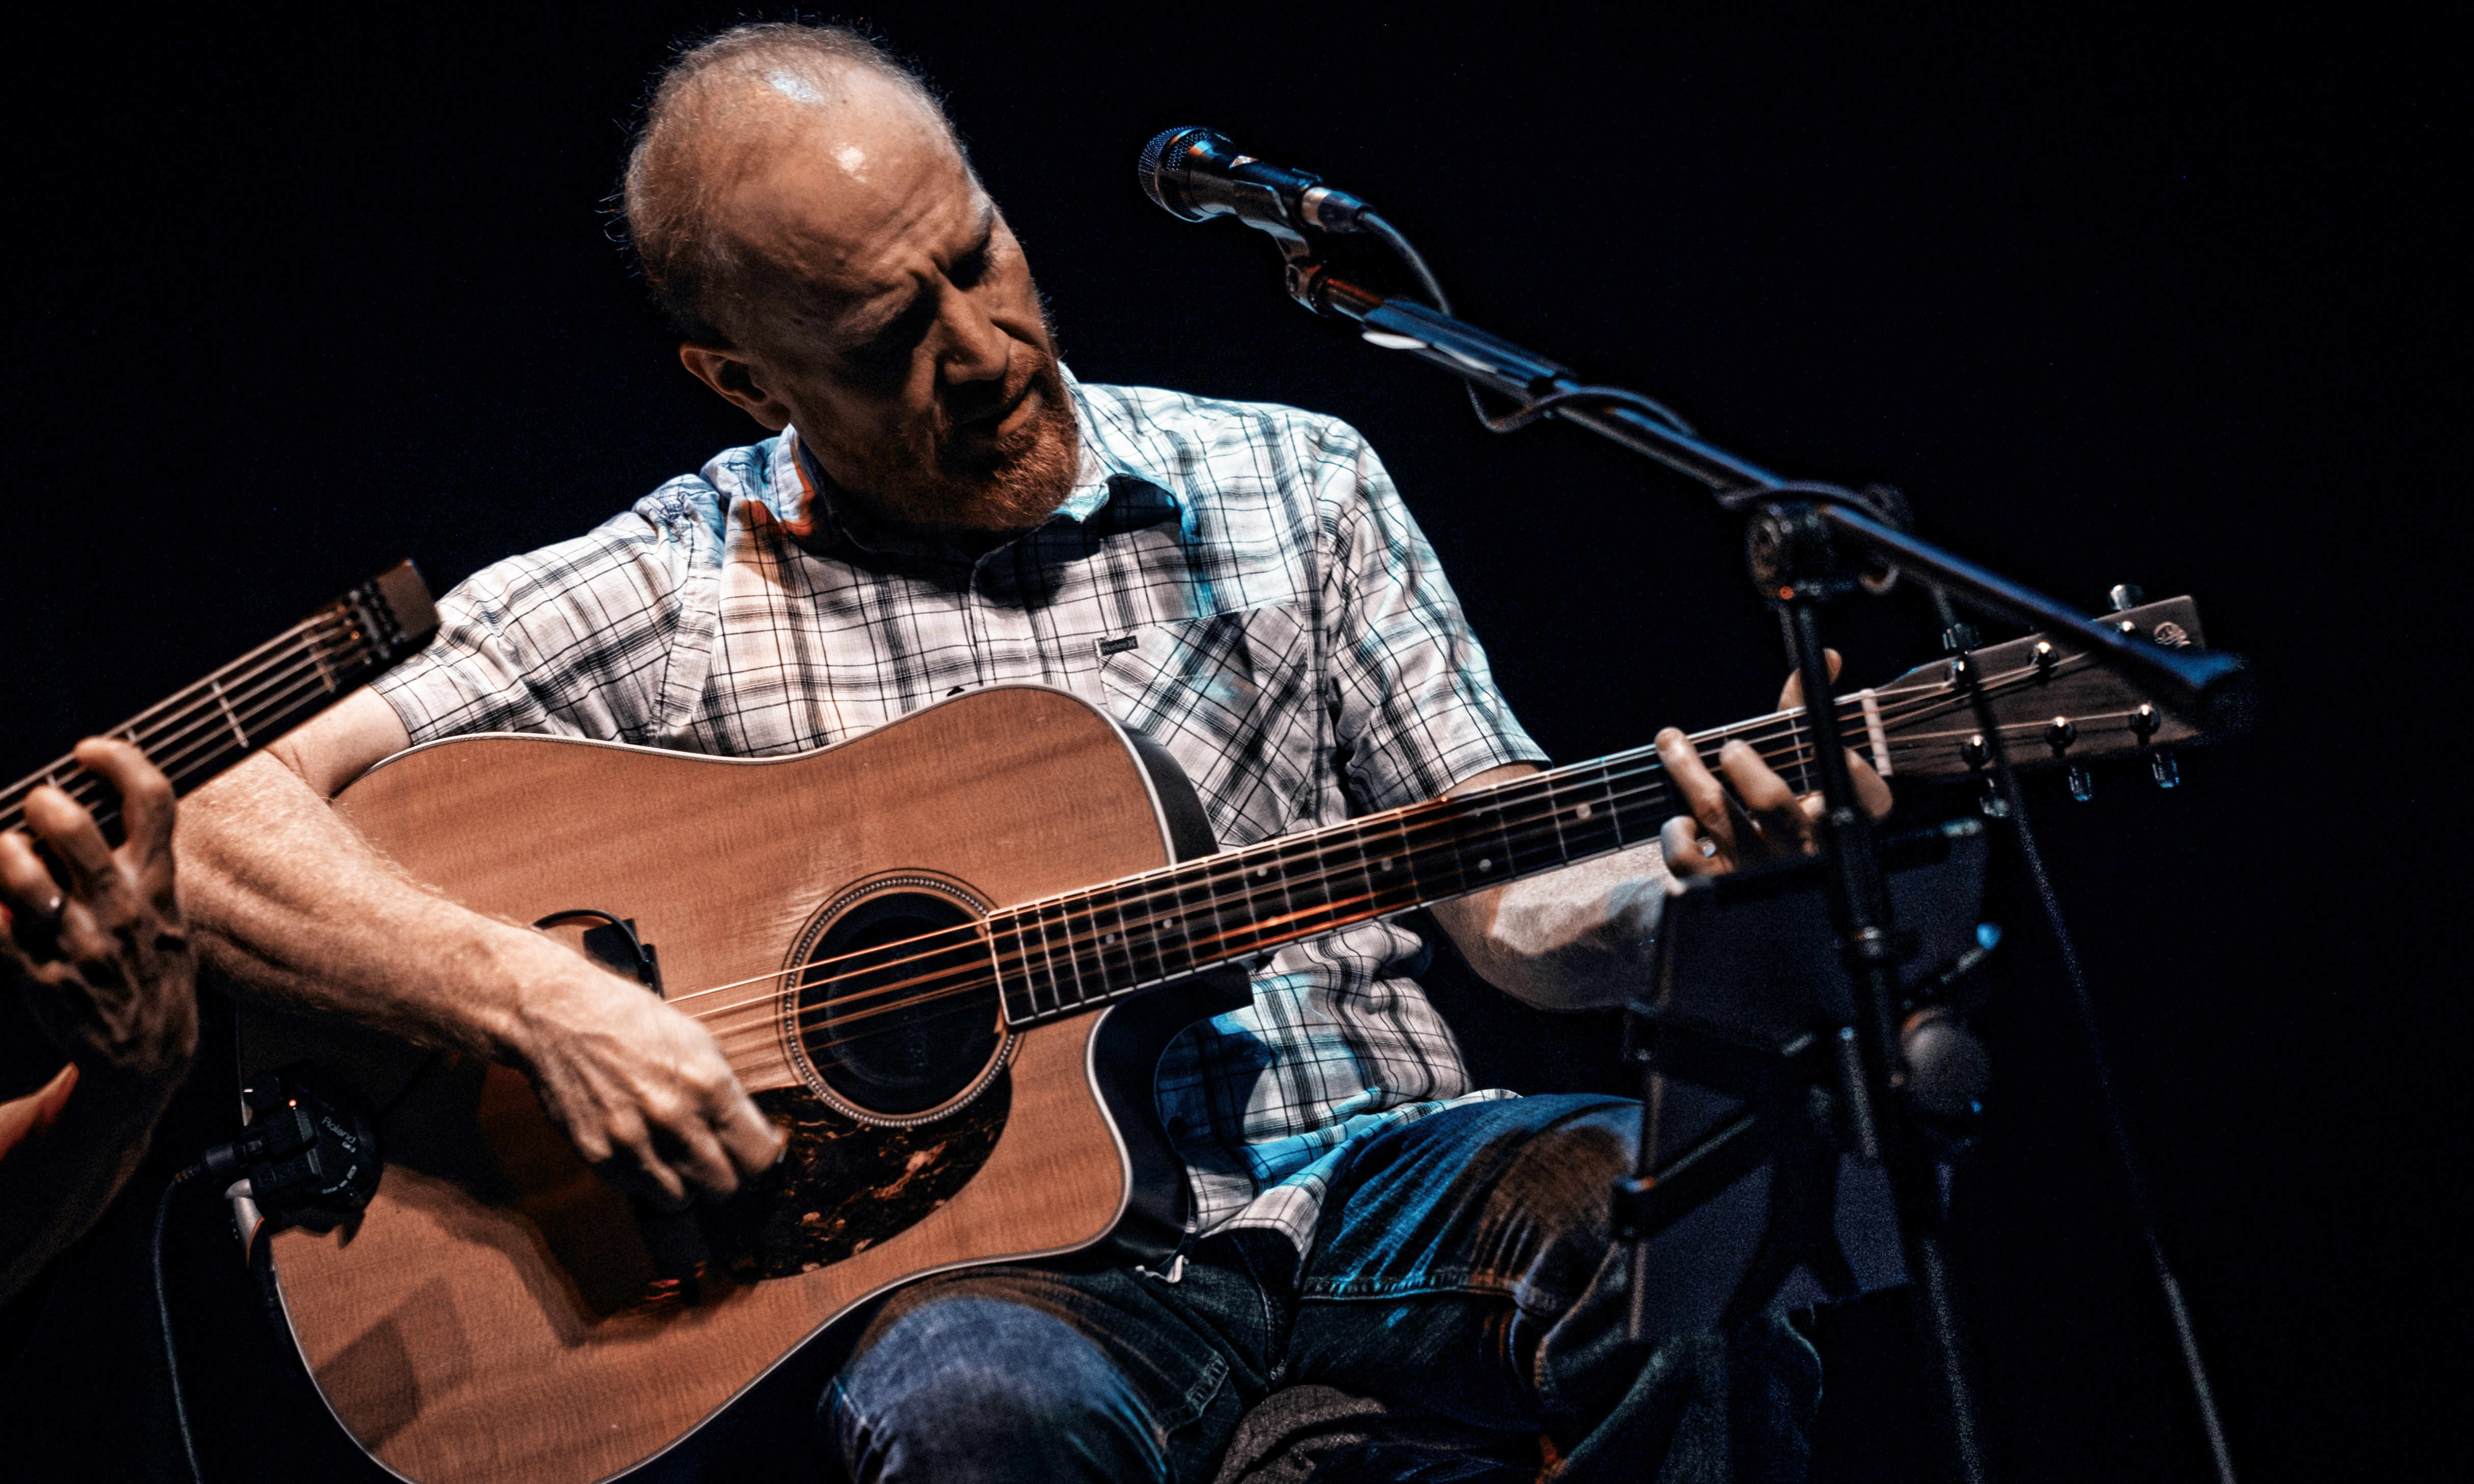 Mike Massé, photo by Keith Reynolds